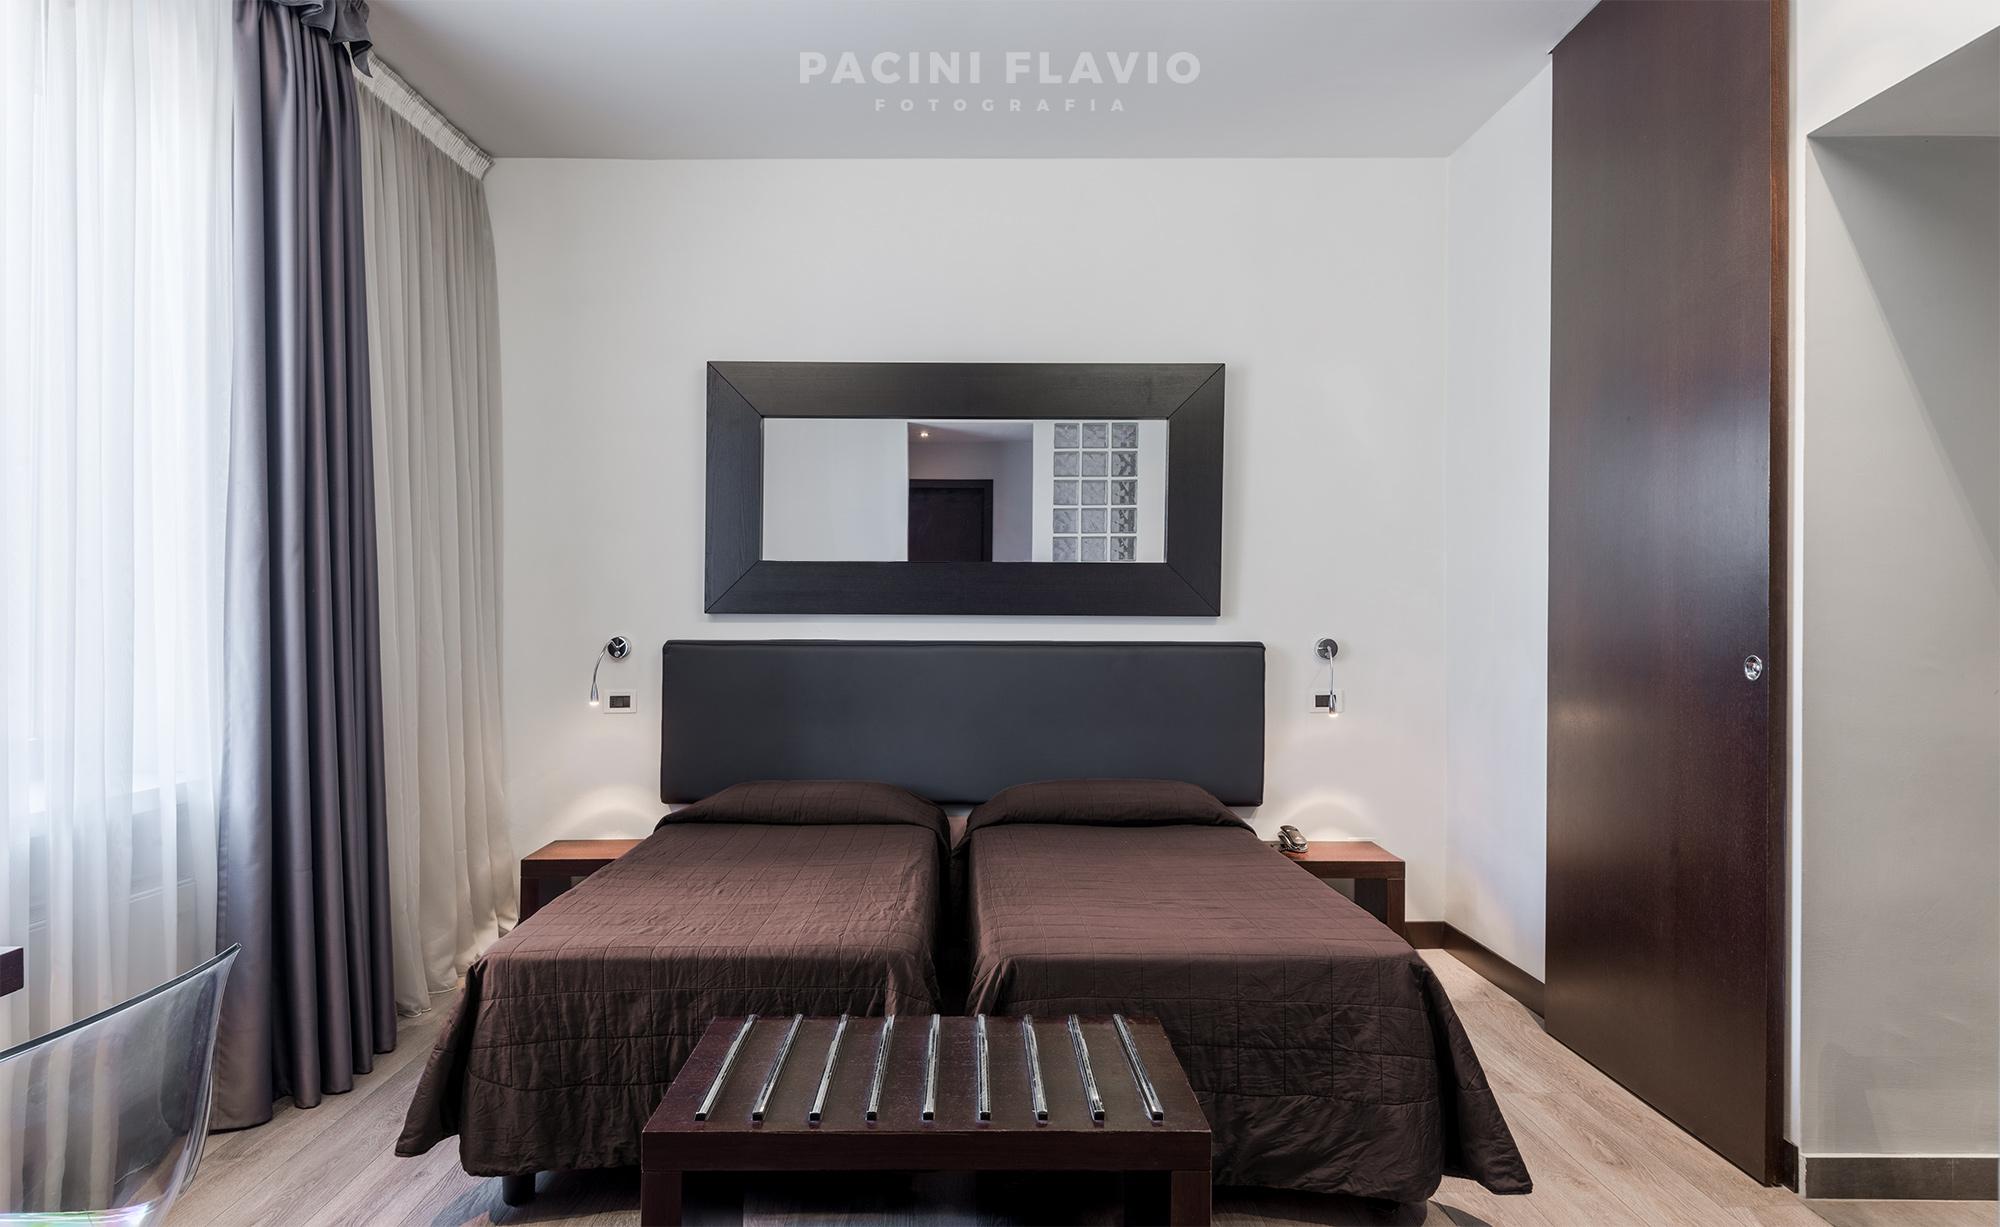 Camera d'hotel in stile moderno